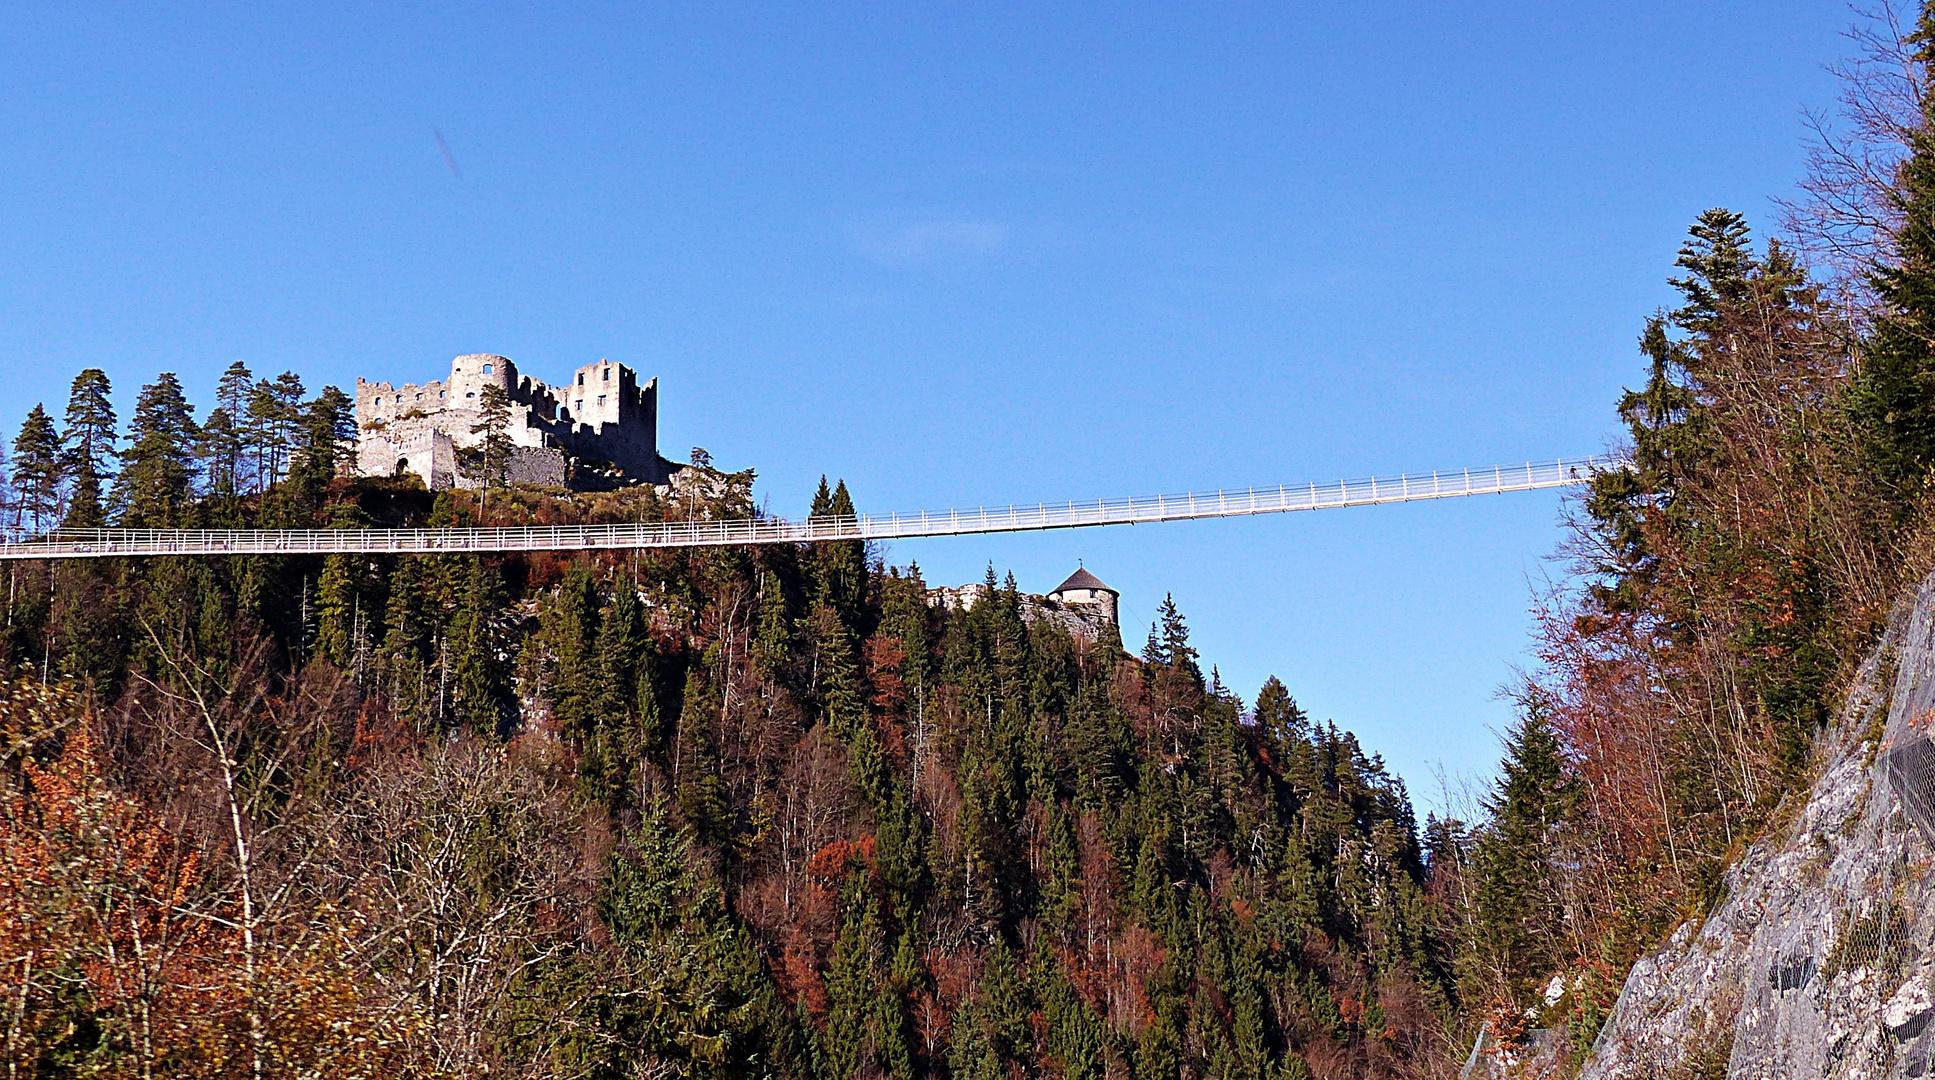 Die Hängebrücke Highline179